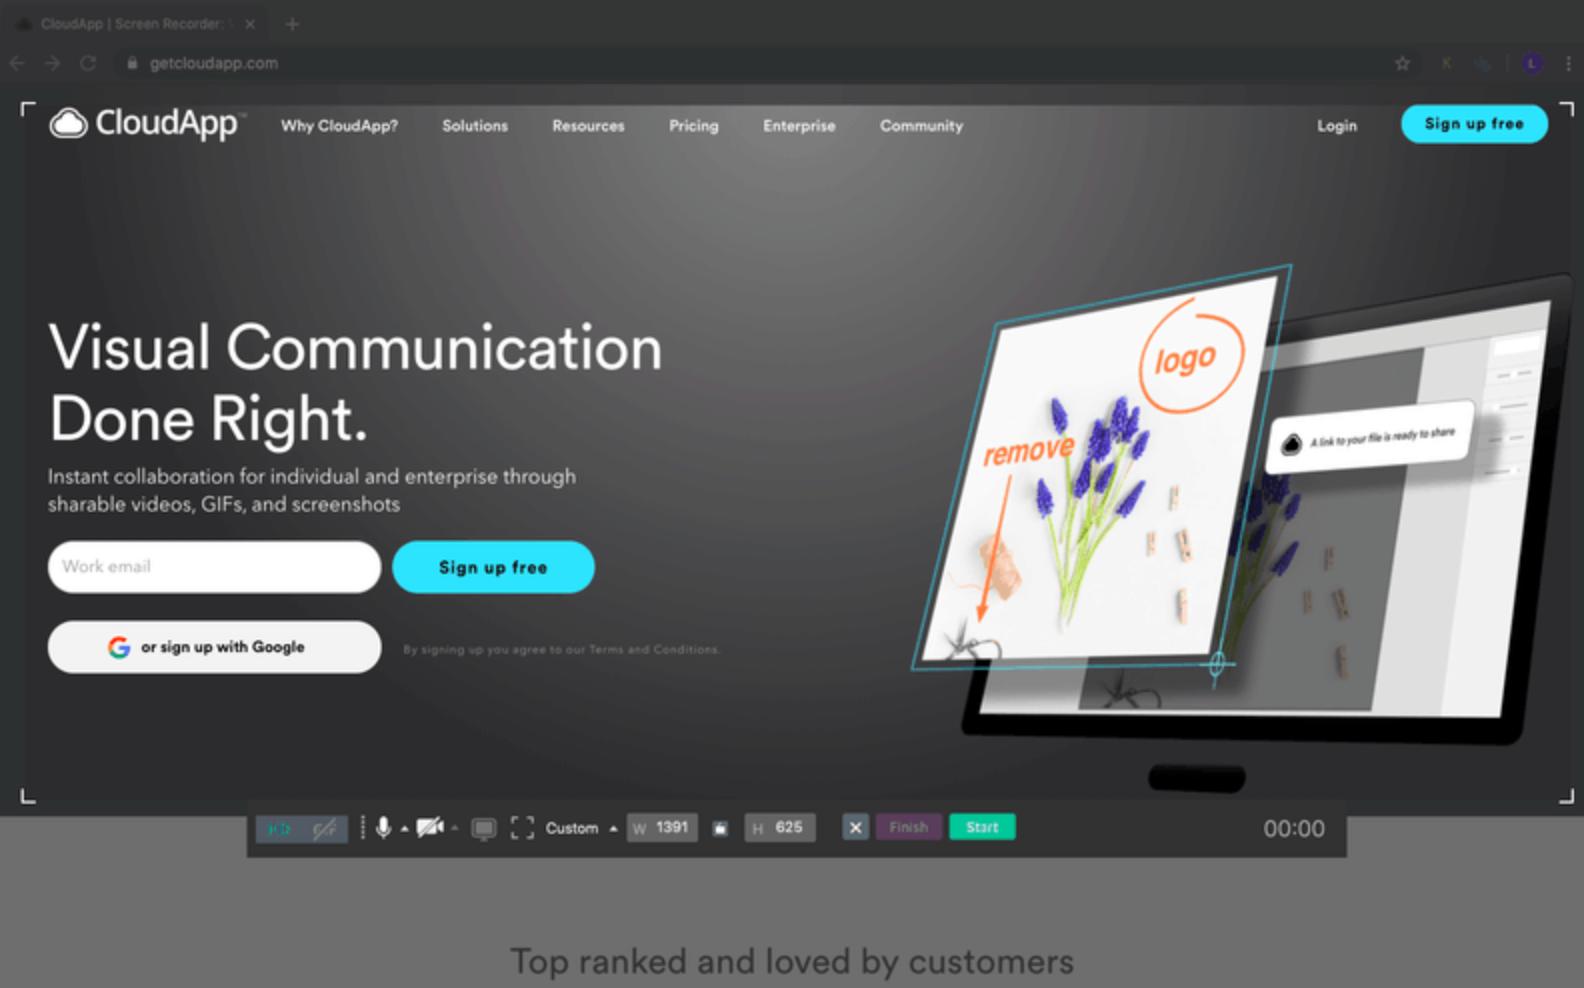 cloudapp screenshot of home page